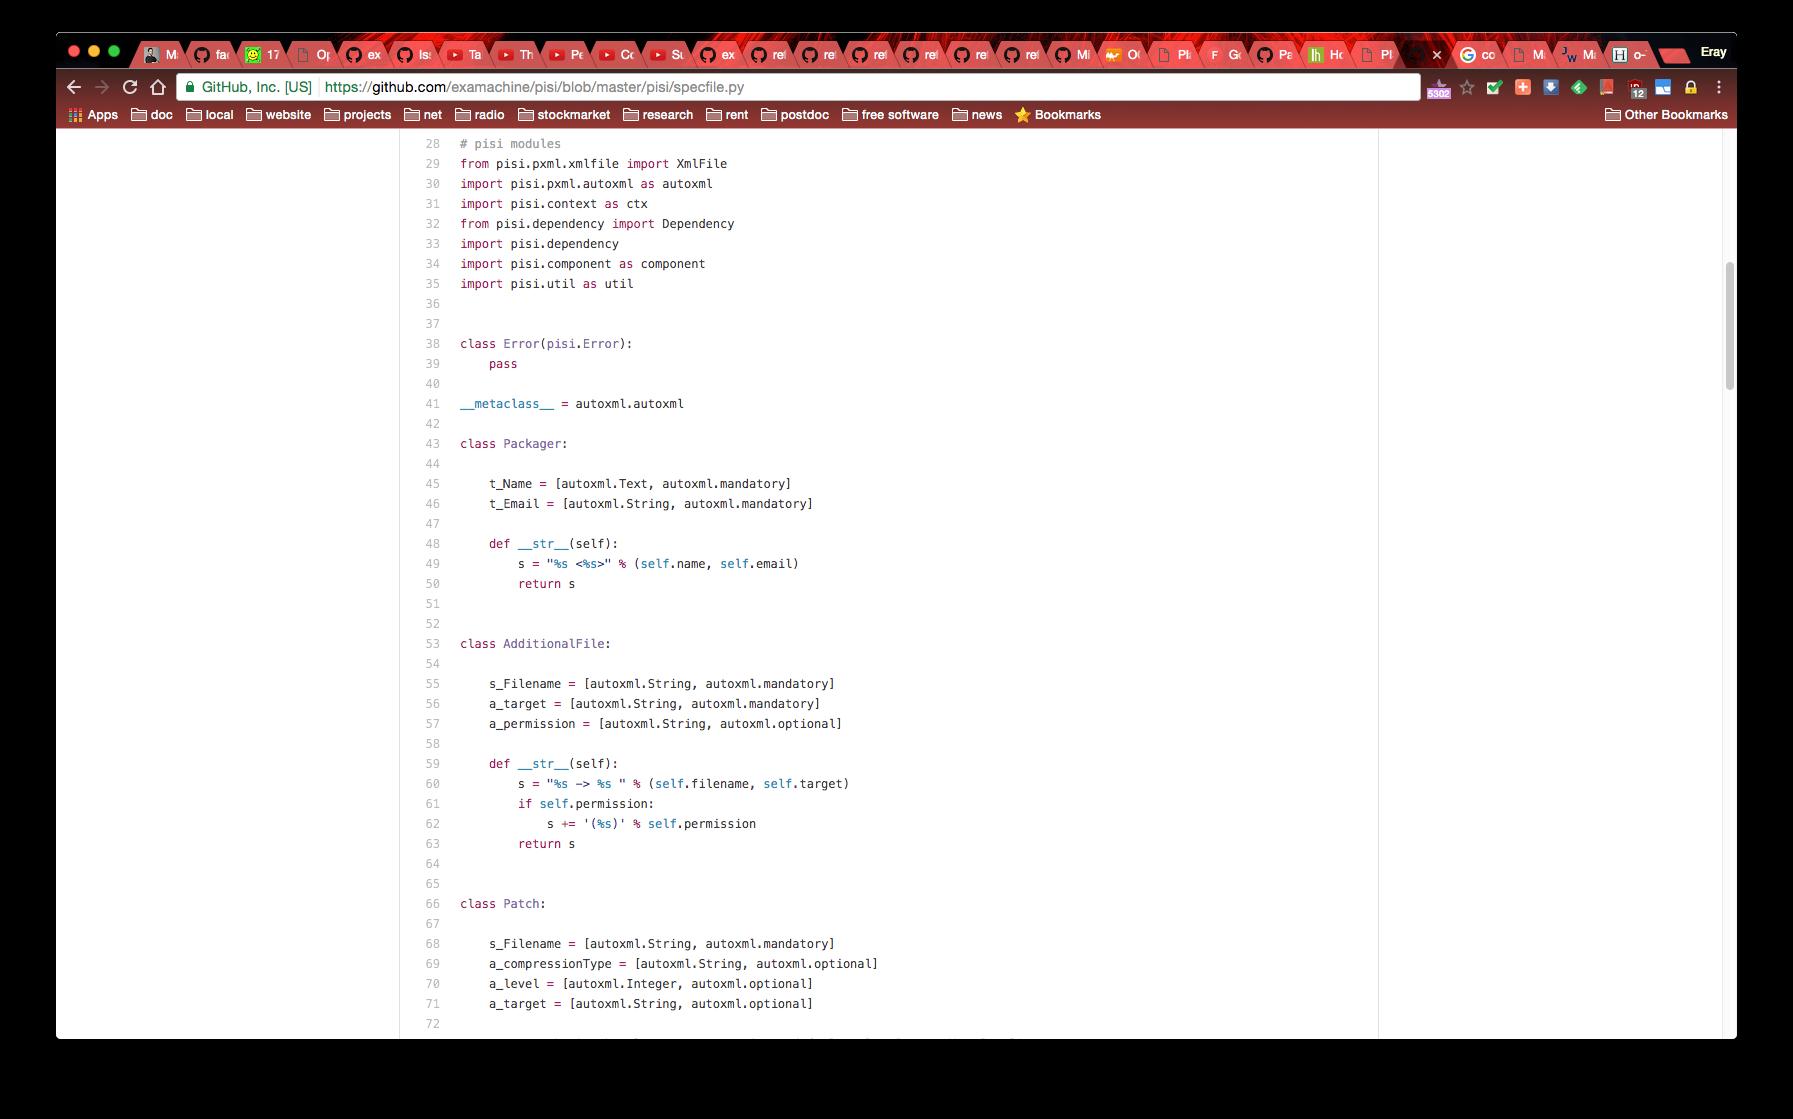 PISI Python Coding Standards